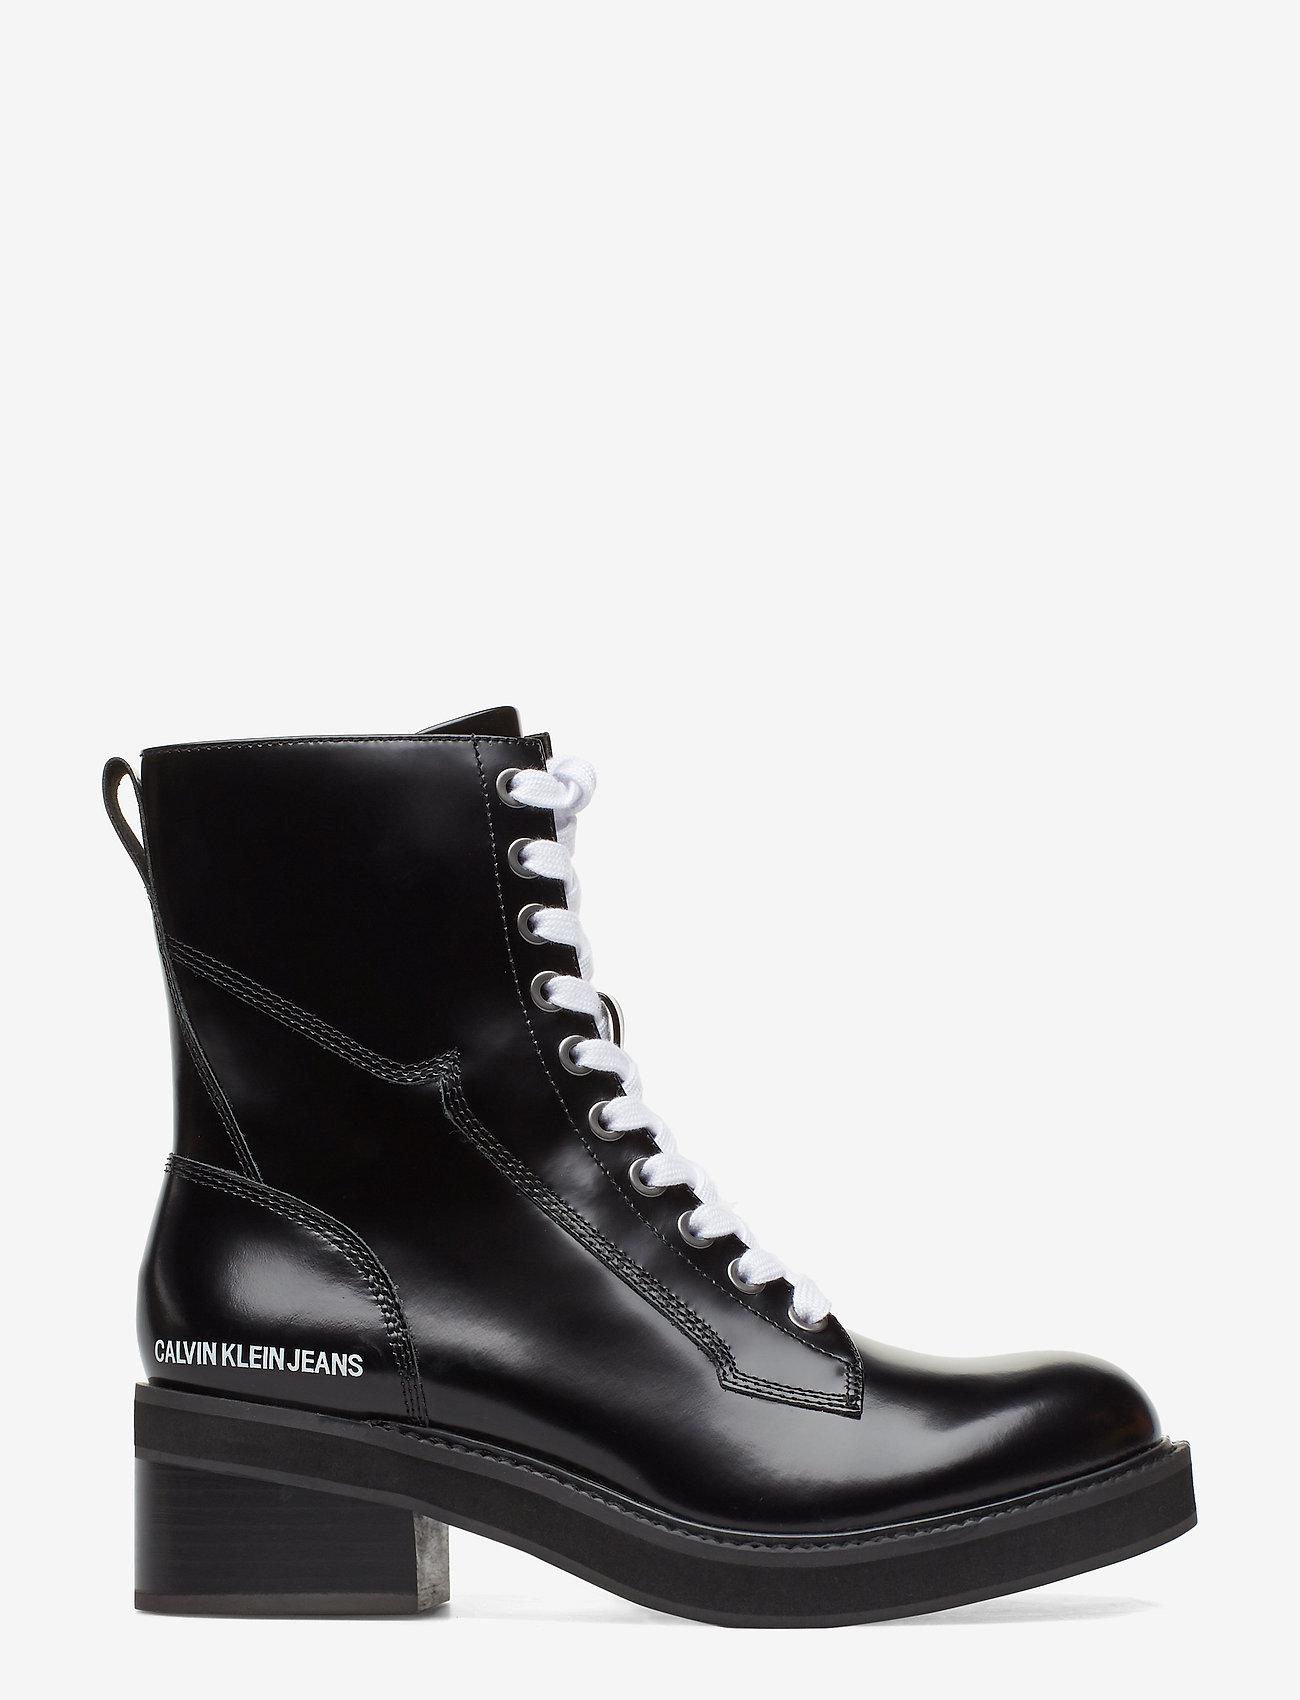 Ebba (Black) - Calvin Klein X1TpoK